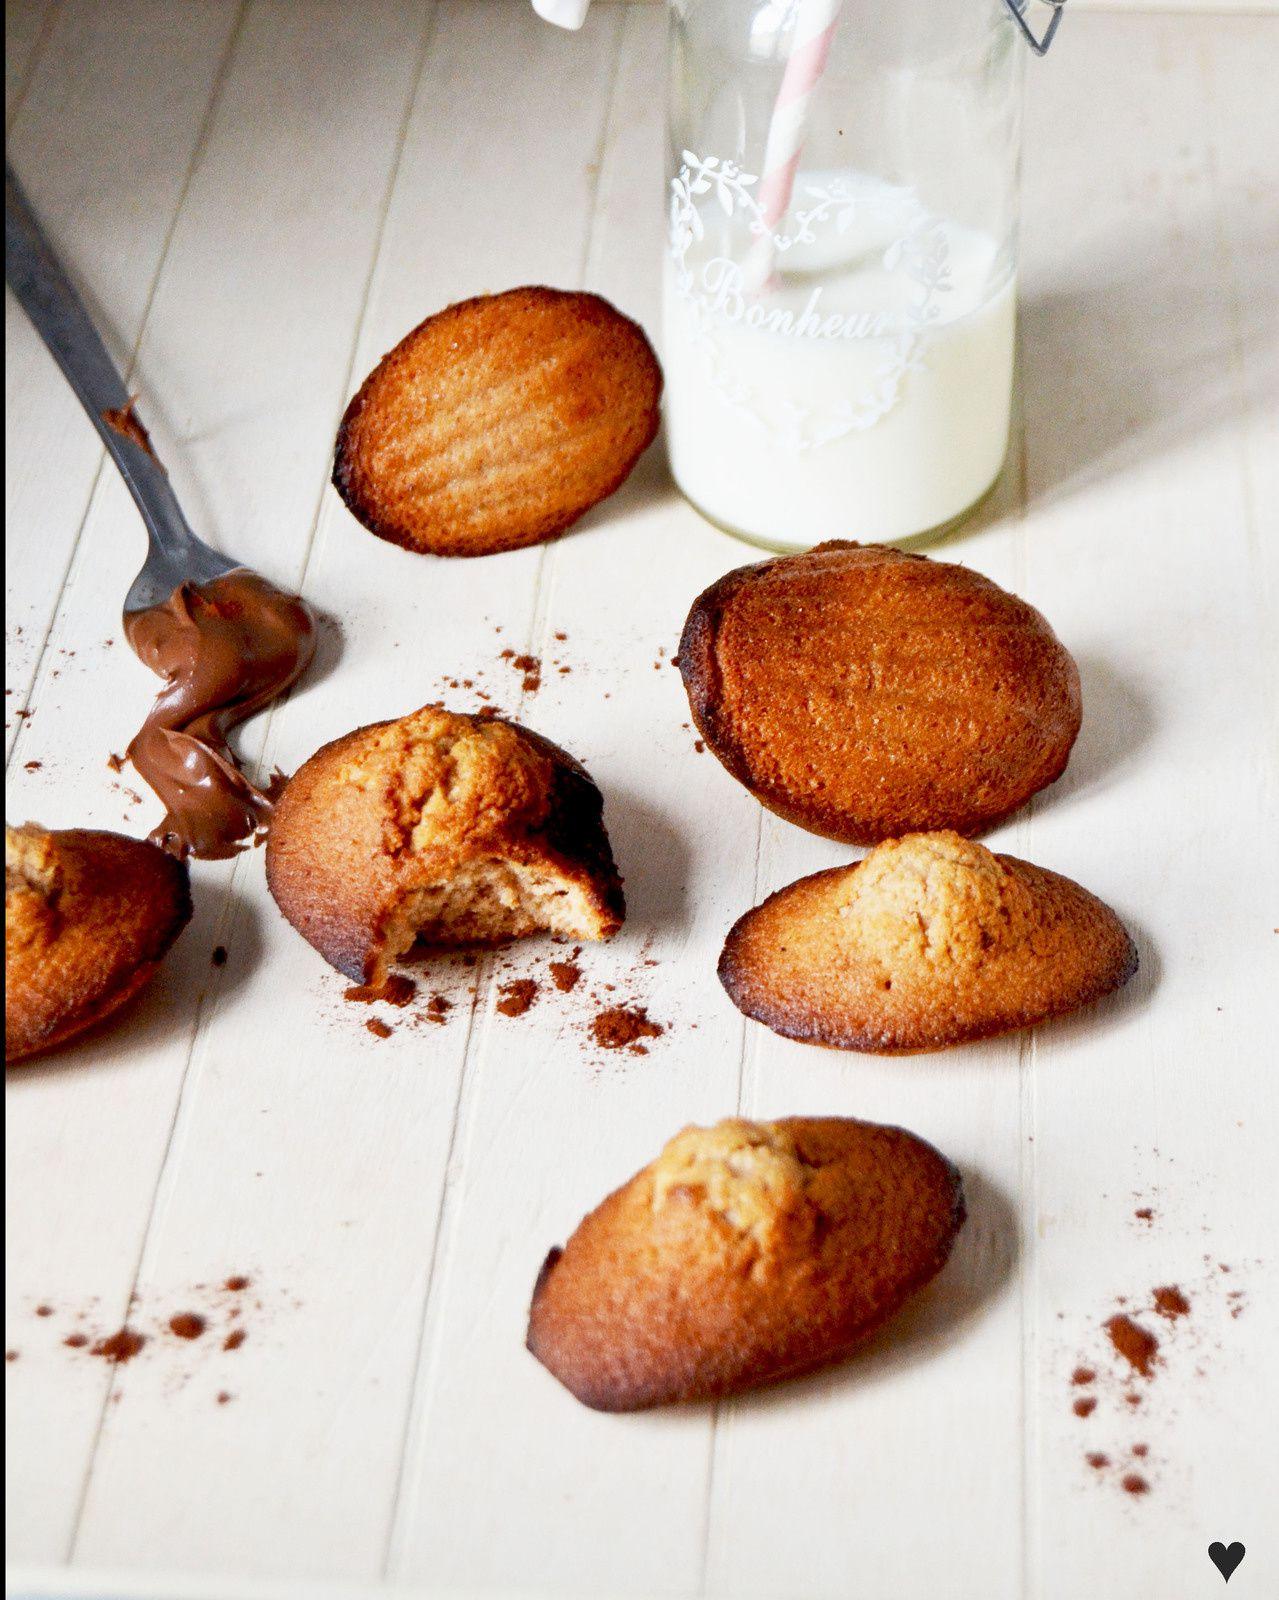 Madeleine au nutella